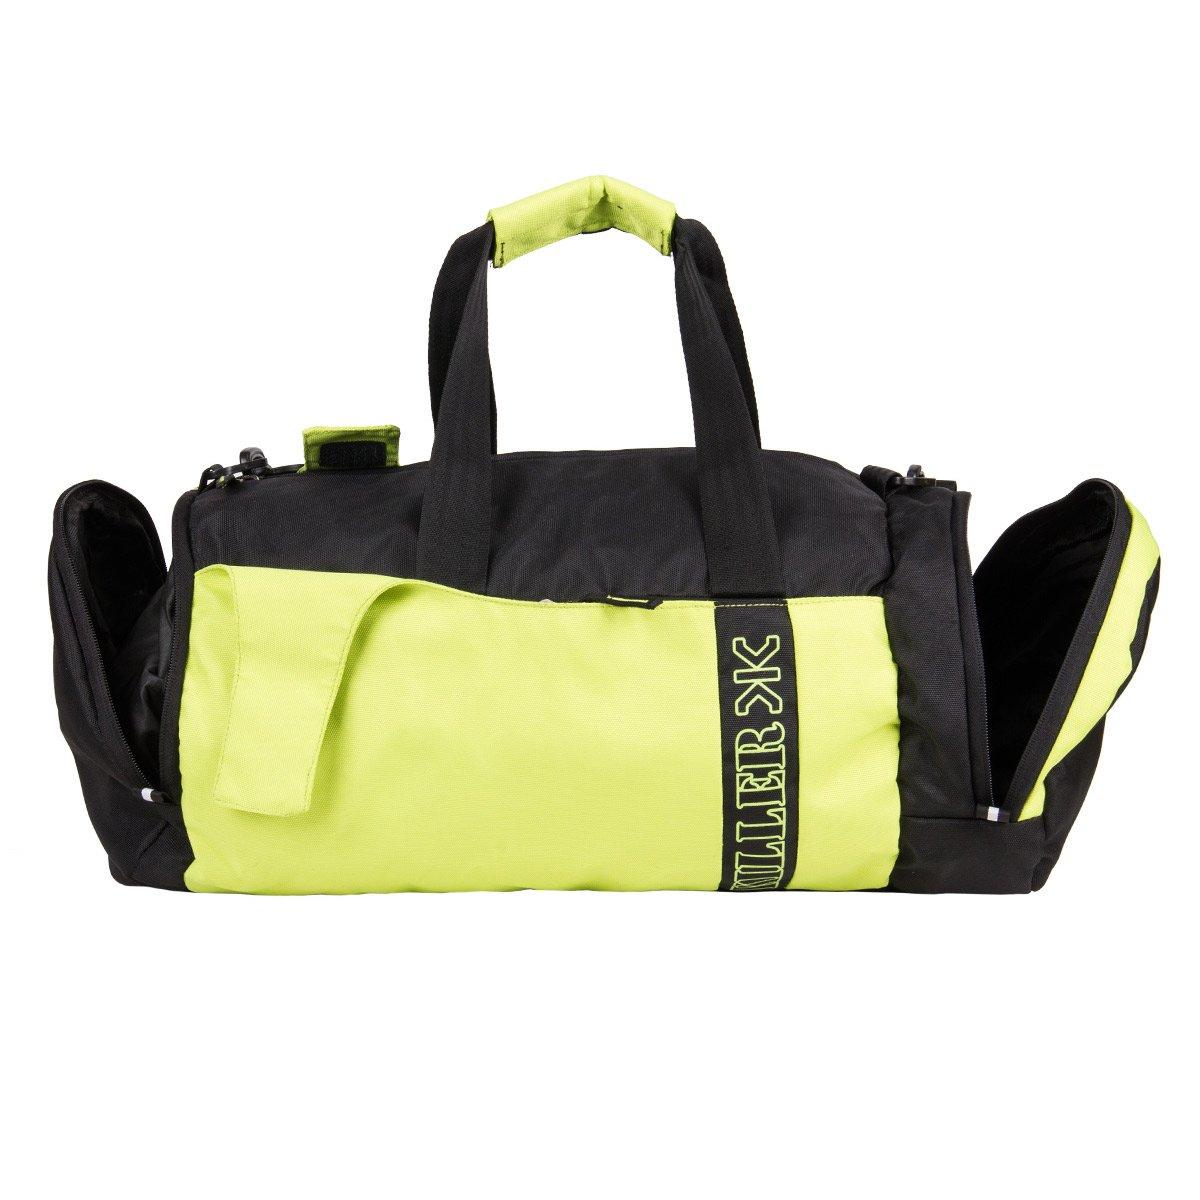 Killer nivia Best Gym Bags in India